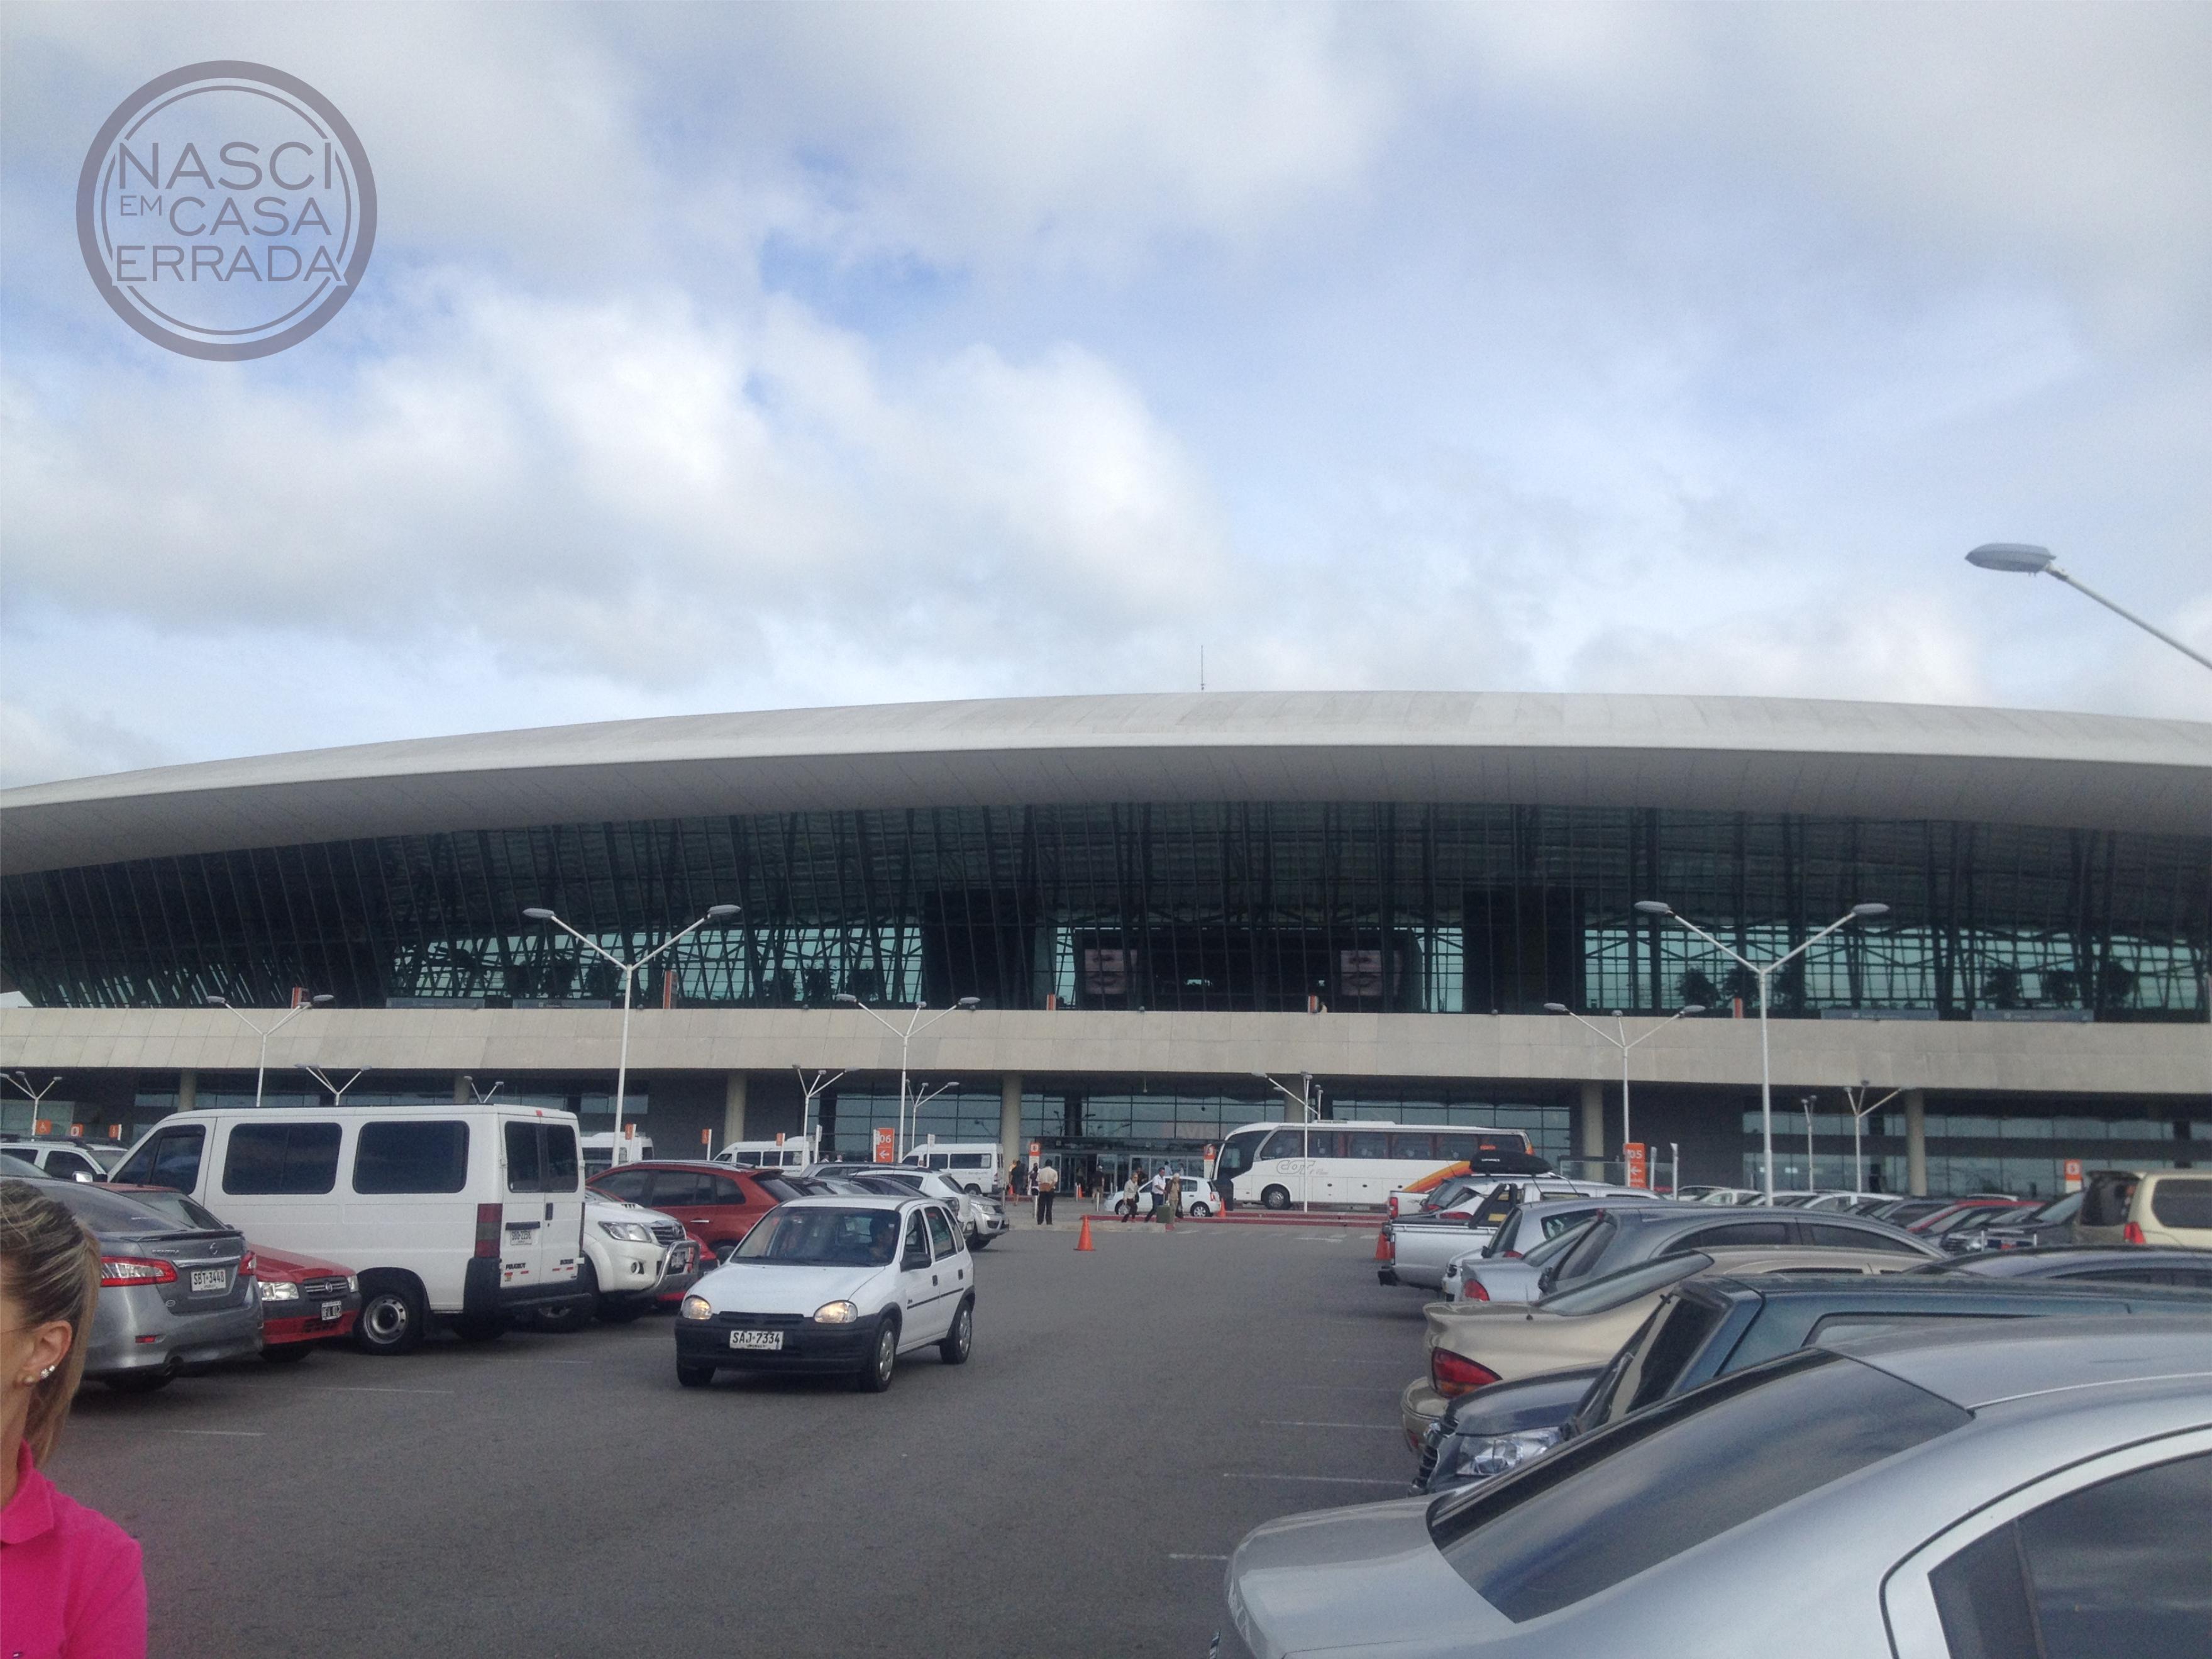 aeroporto carrasco montevideo 02